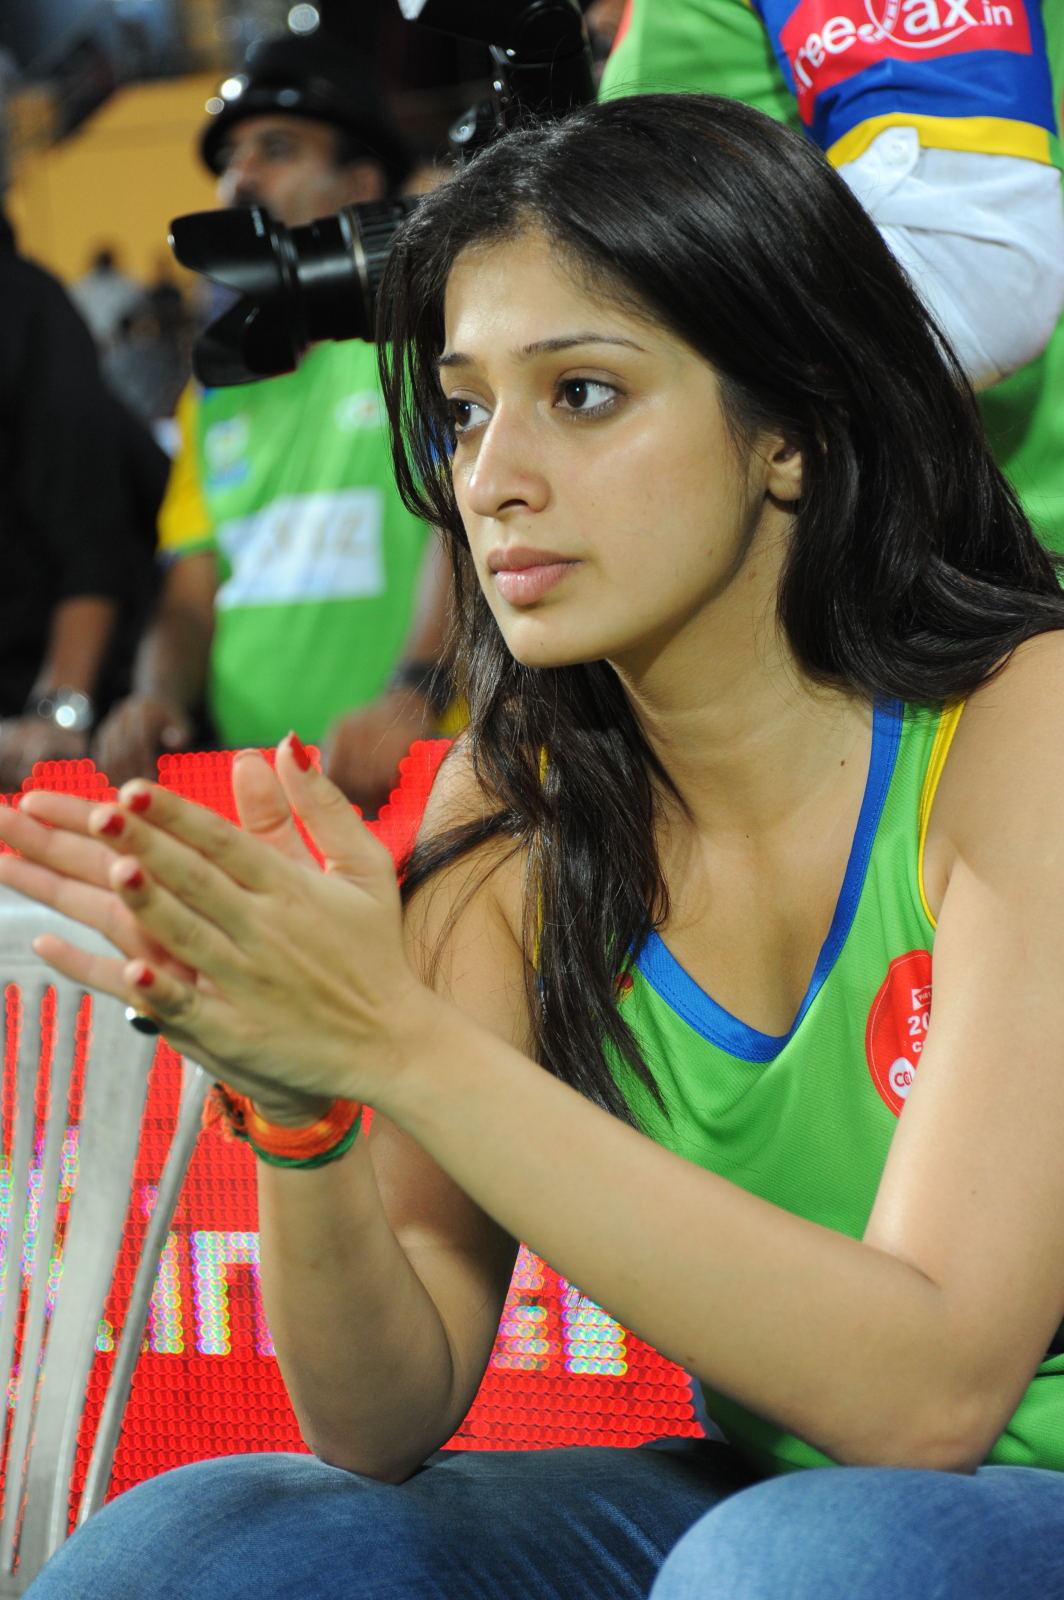 Hot Photos At CCL 2 Matches. South Actress Cheering at CCl 2 matches ...